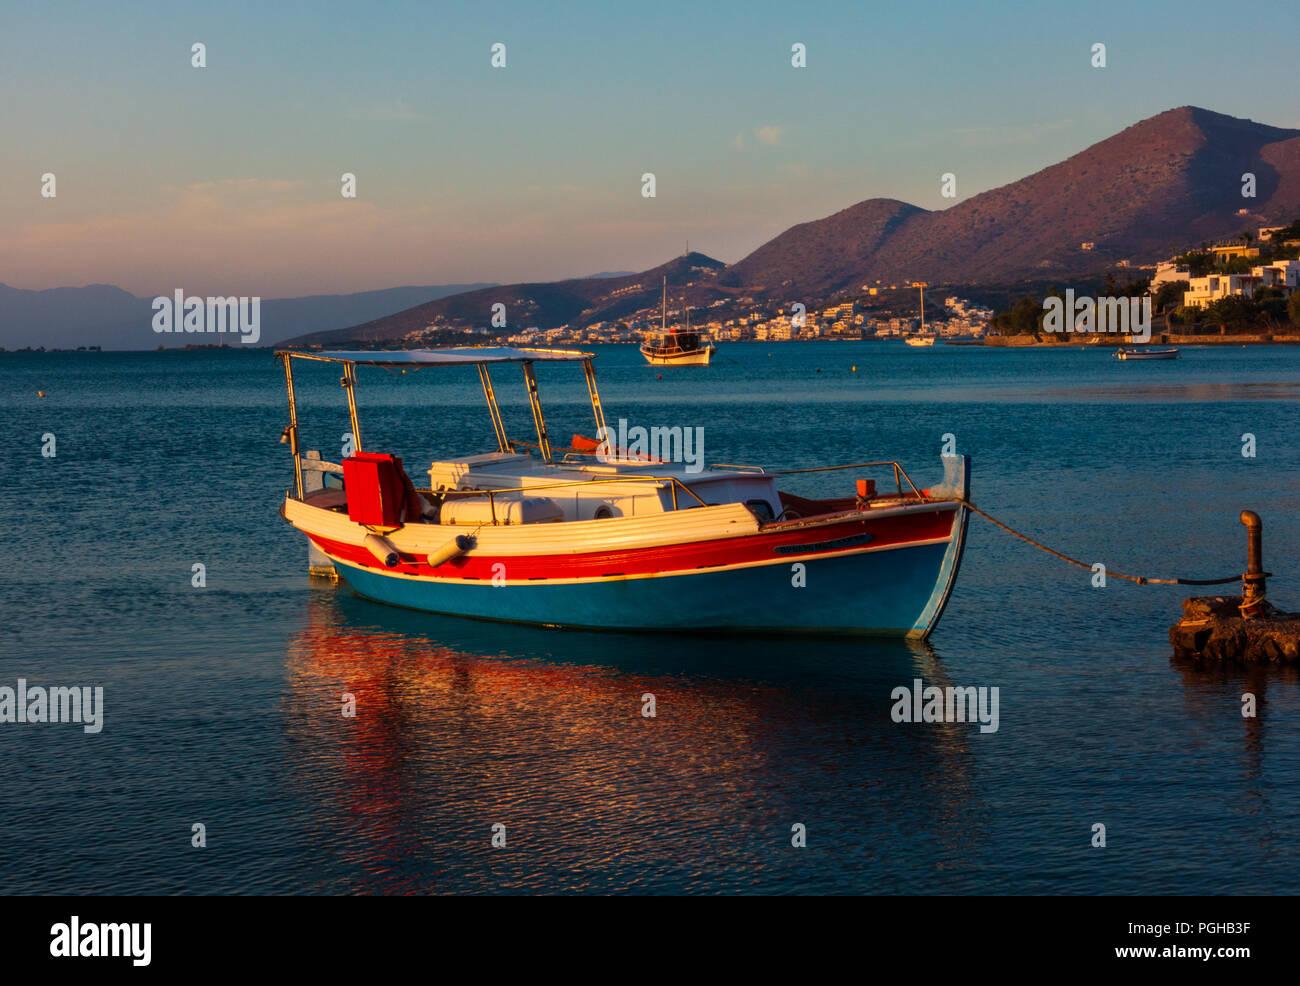 Fishing boat at down, Gulf of Mirabello, Crete Stock Photo